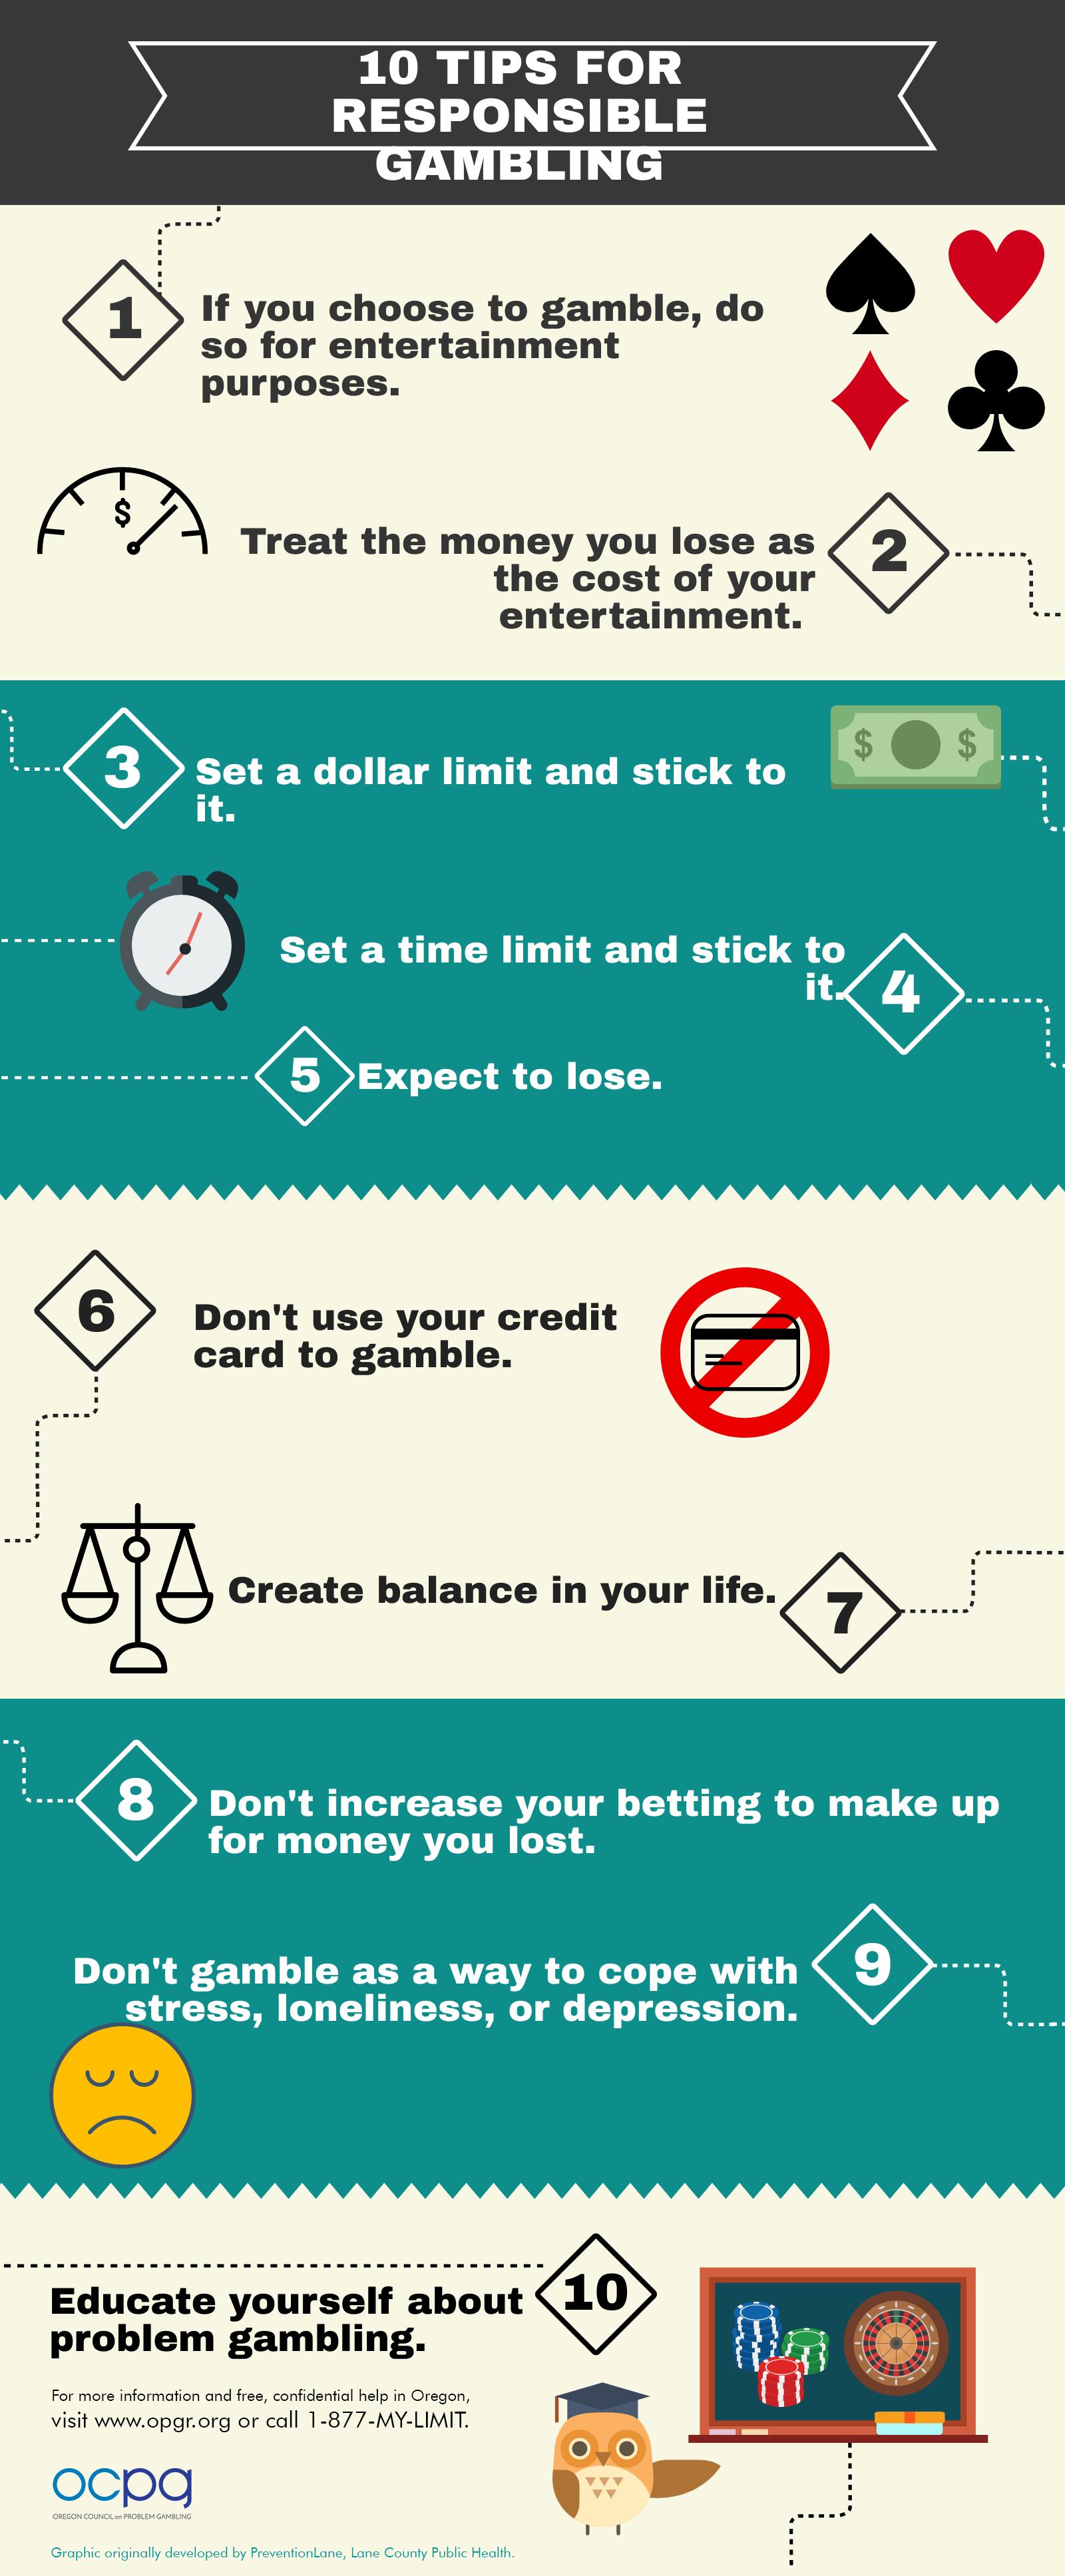 10 tips for responsible gambling